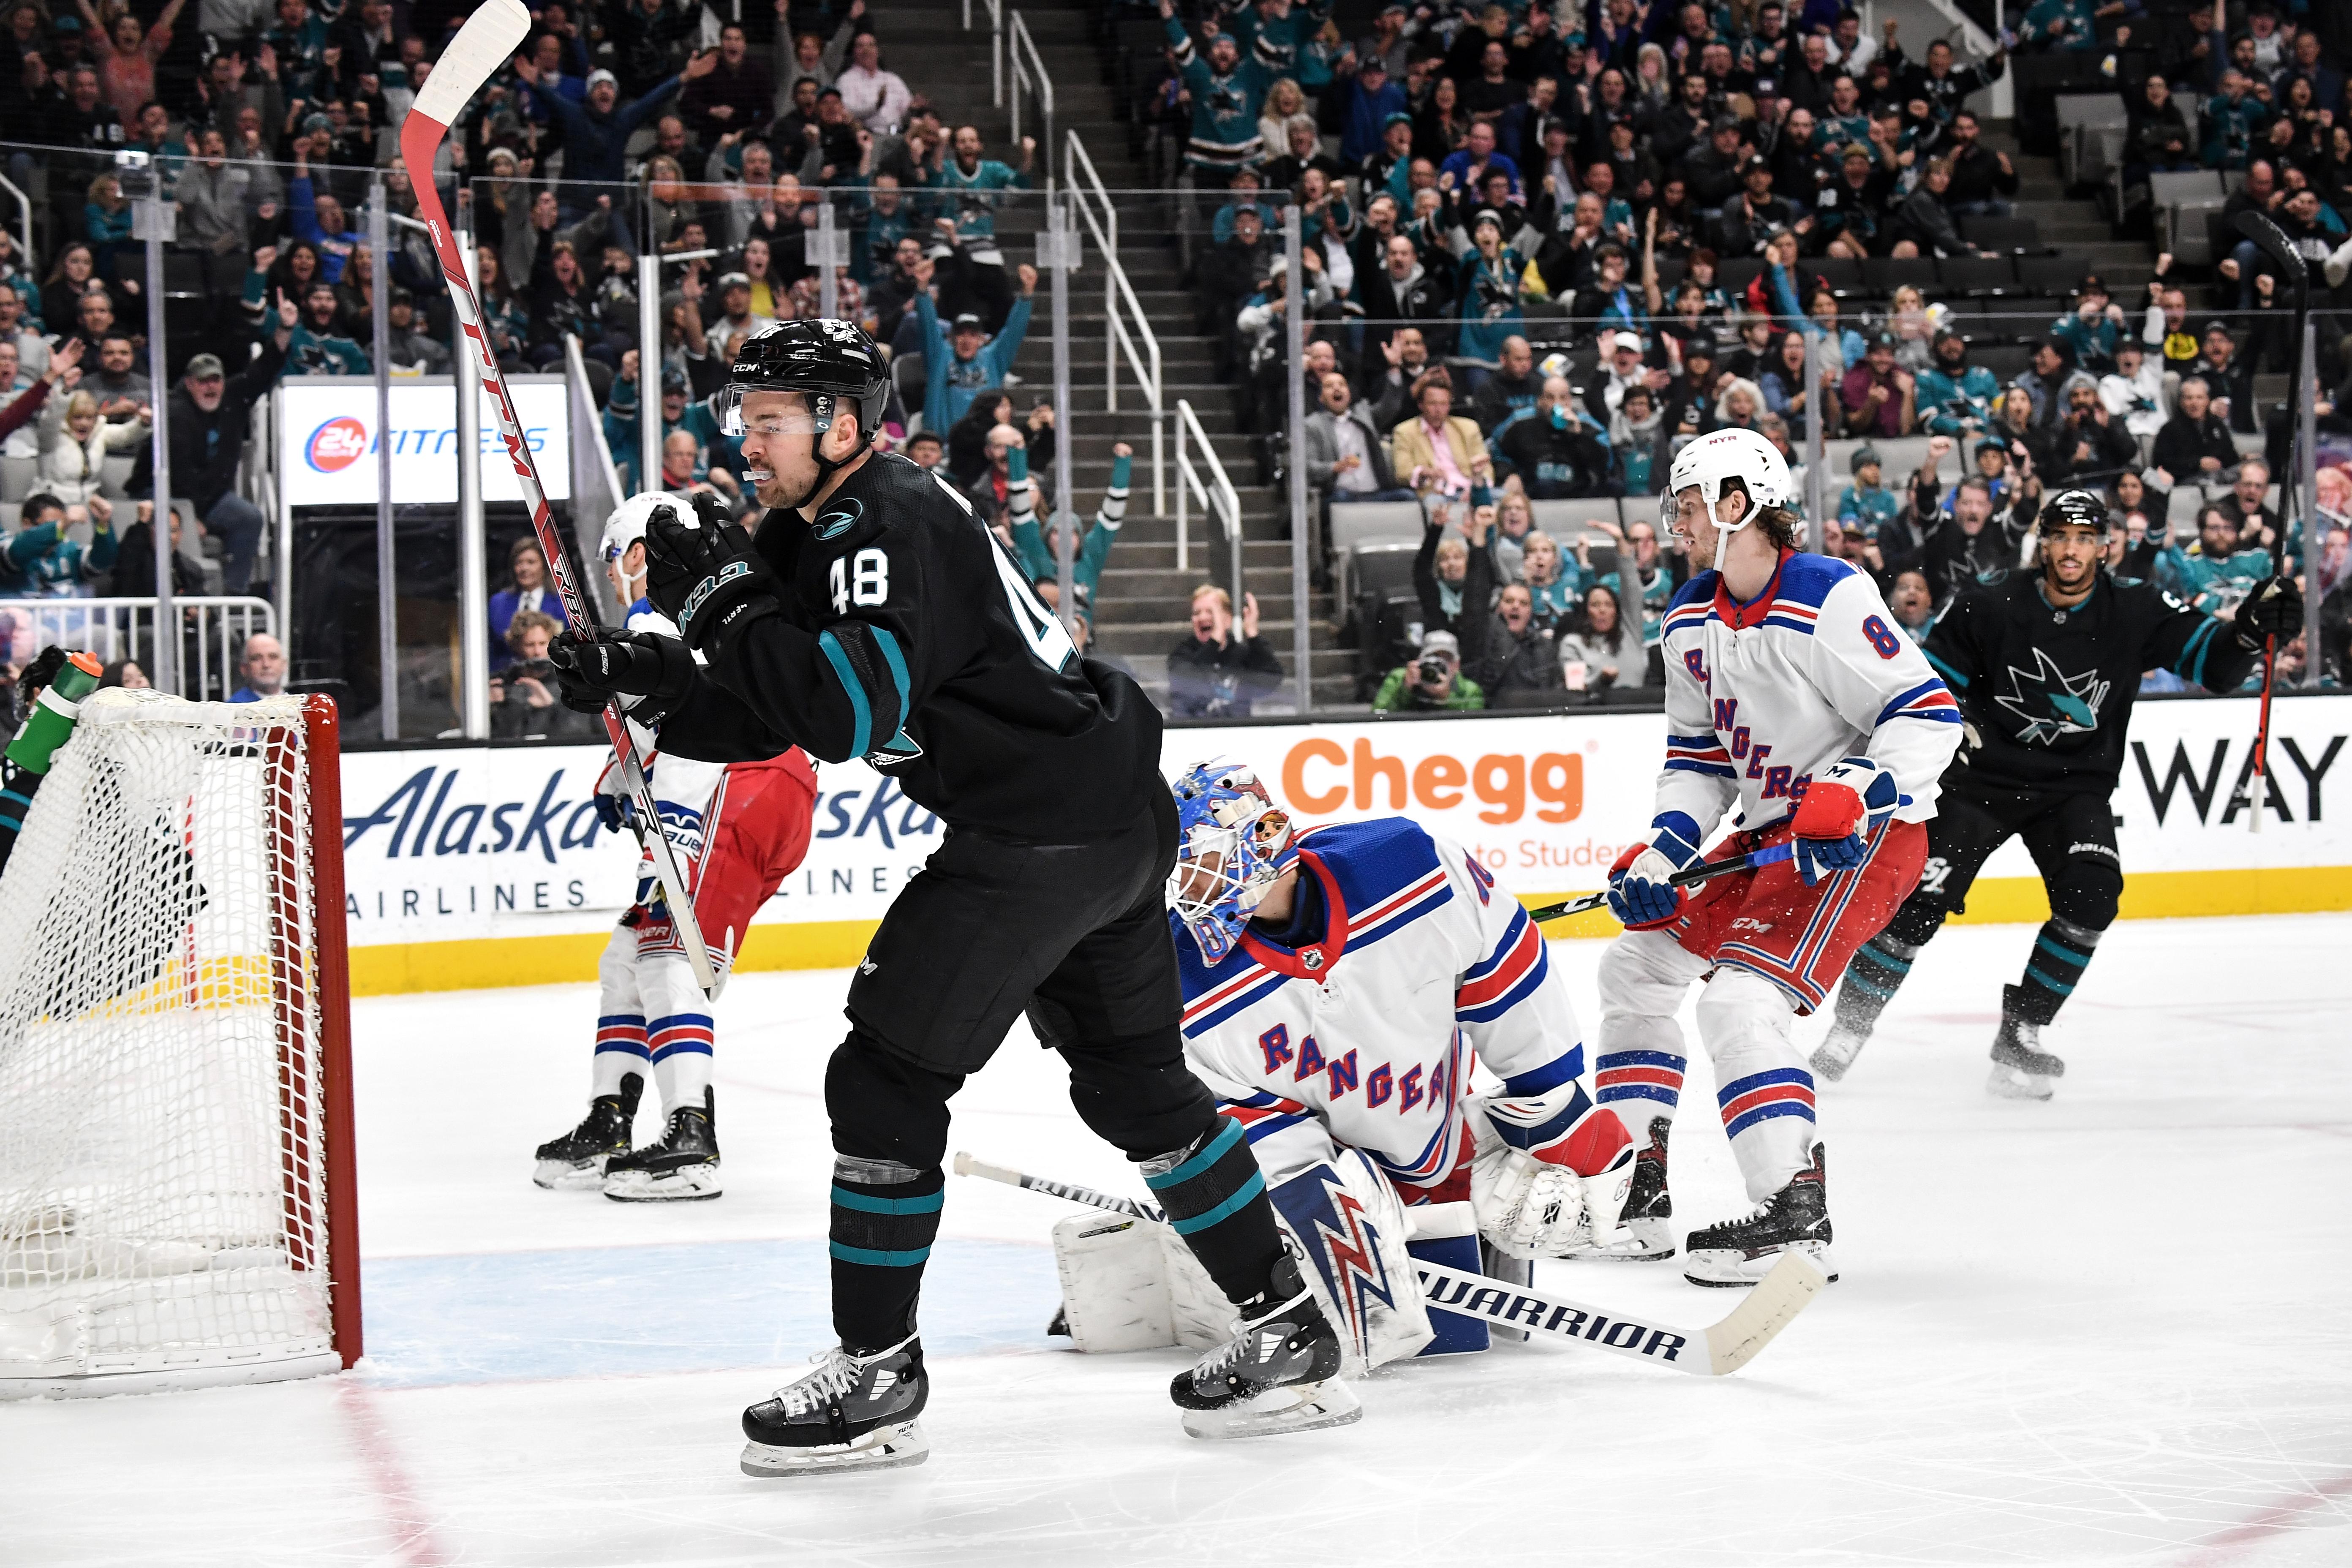 Tomas Hertl #48 of the San Jose Sharks celebrates scoring a goal against the New York Rangers at SAP Center on December 12, 2019 in San Jose, California.